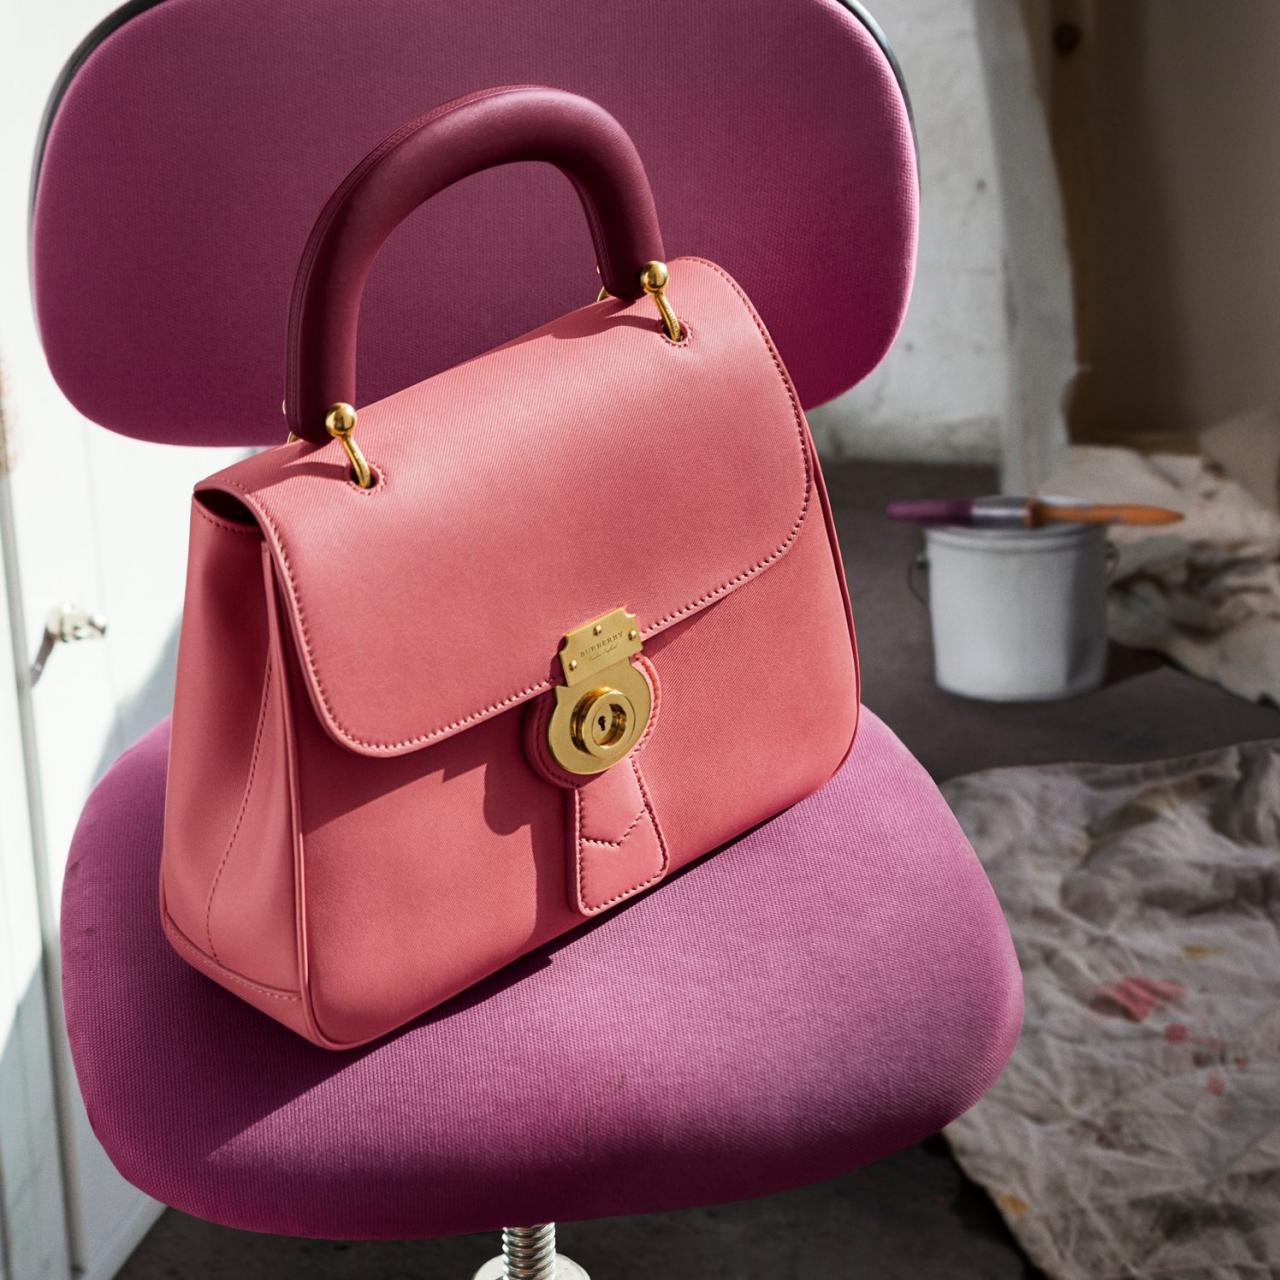 Burberry DK88 Pink